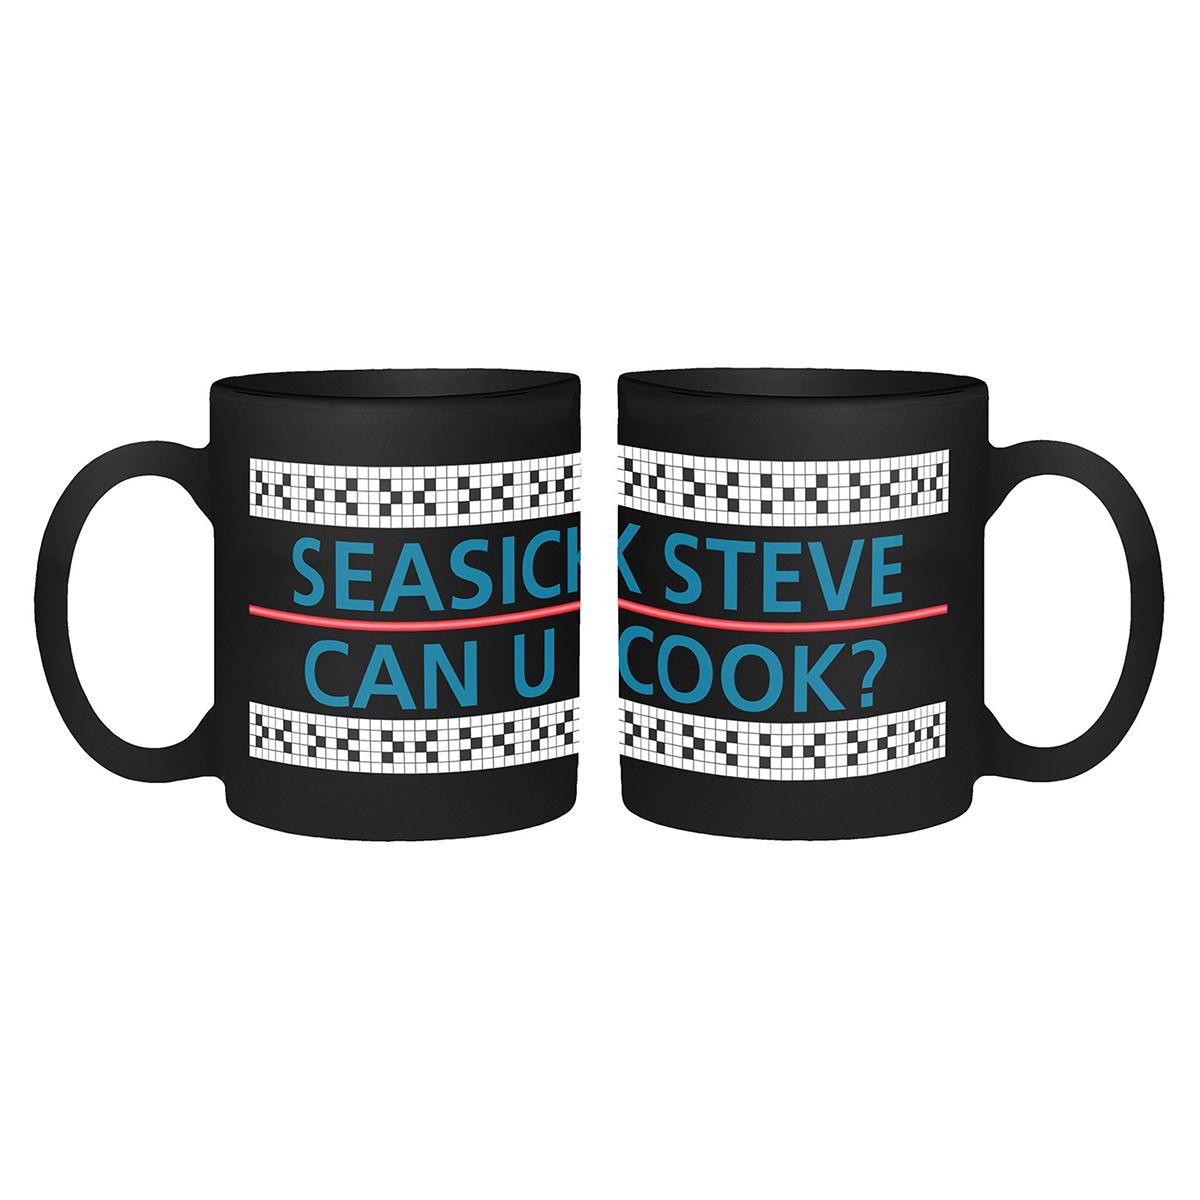 Can You Cook - Black Mug - Seasick Steve